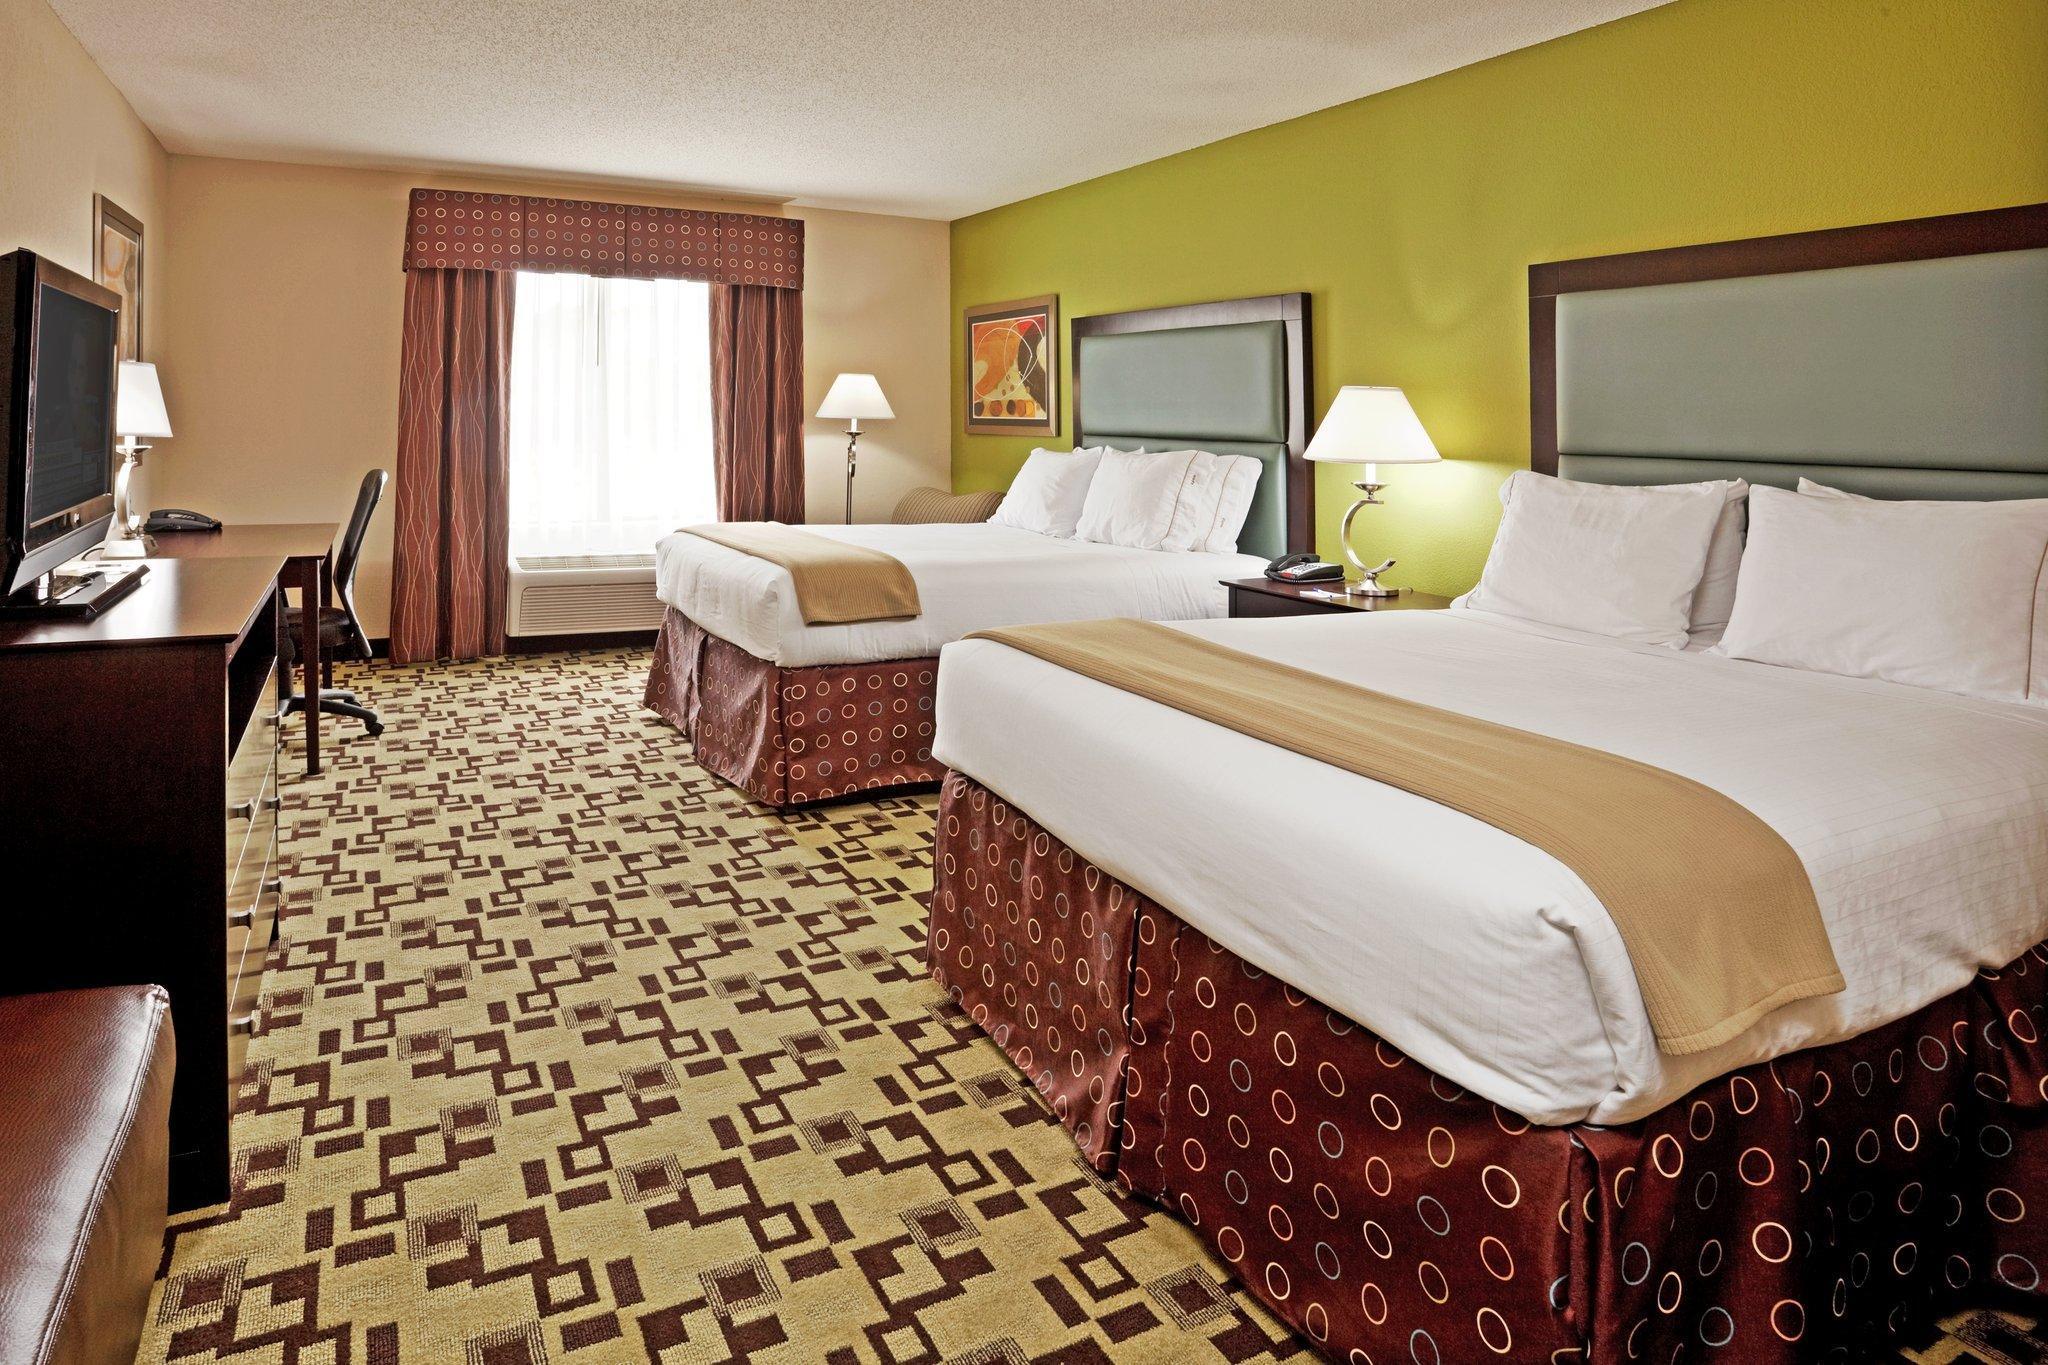 Holiday Inn Express Troutville, Botetourt